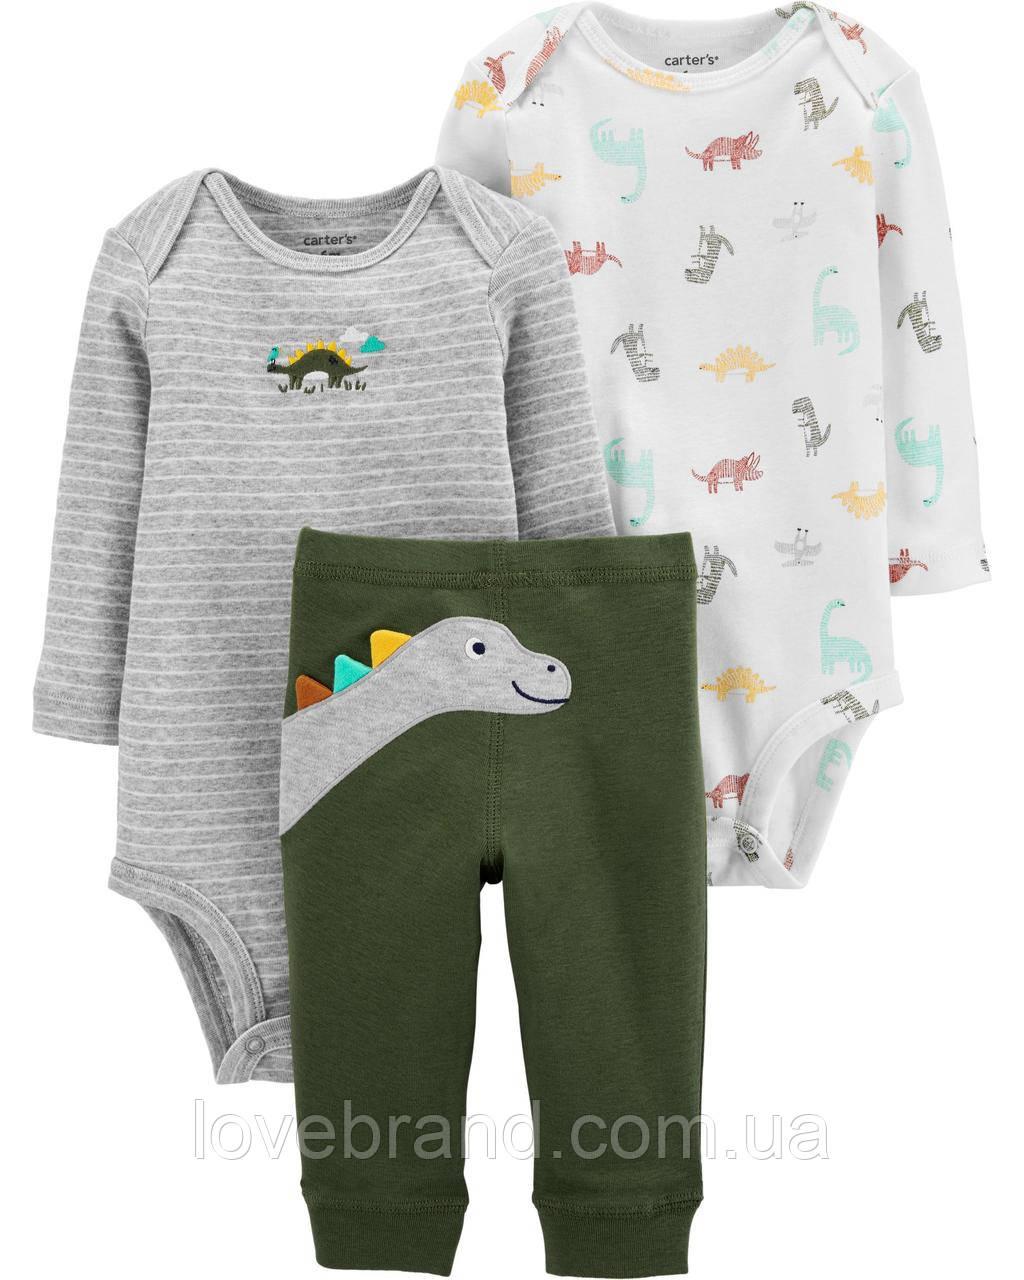 "Набор для мальчика Carter's ""Динозавр""два бодики + штанишки картерс"